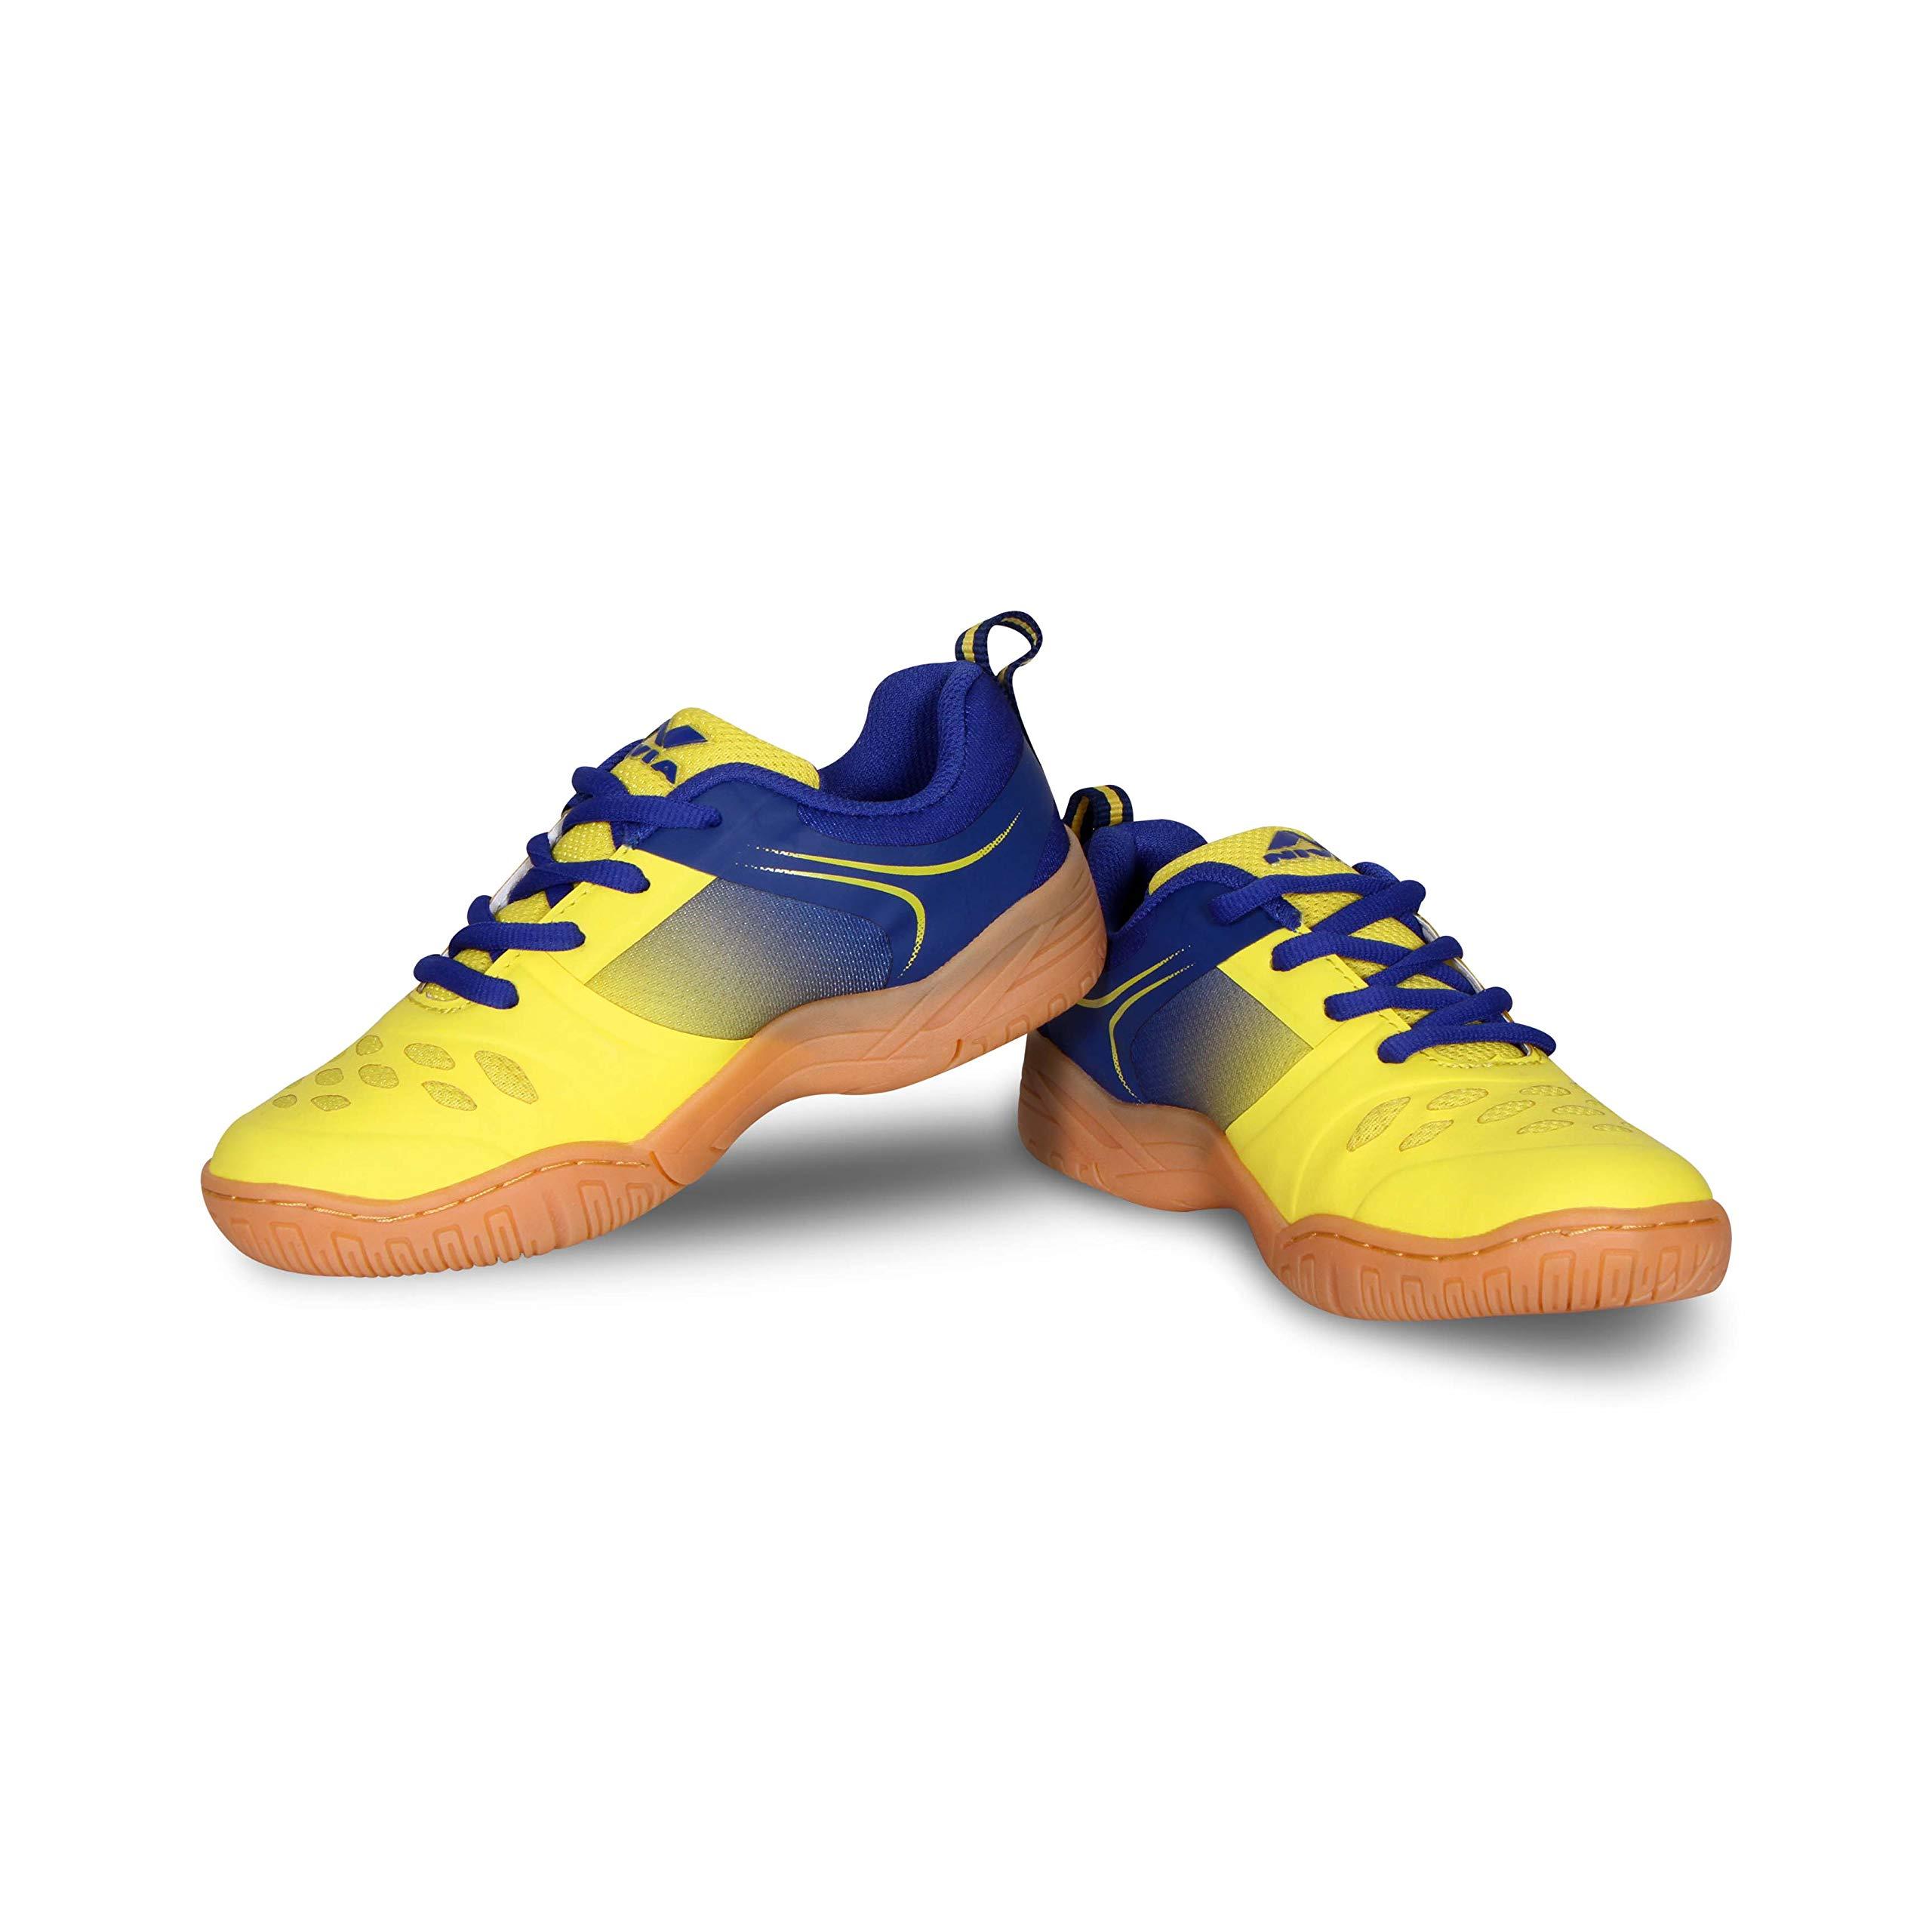 HY-Court Kids 2.0 Badminton Shoe (B07W3DRHKR) Amazon Price History, Amazon Price Tracker